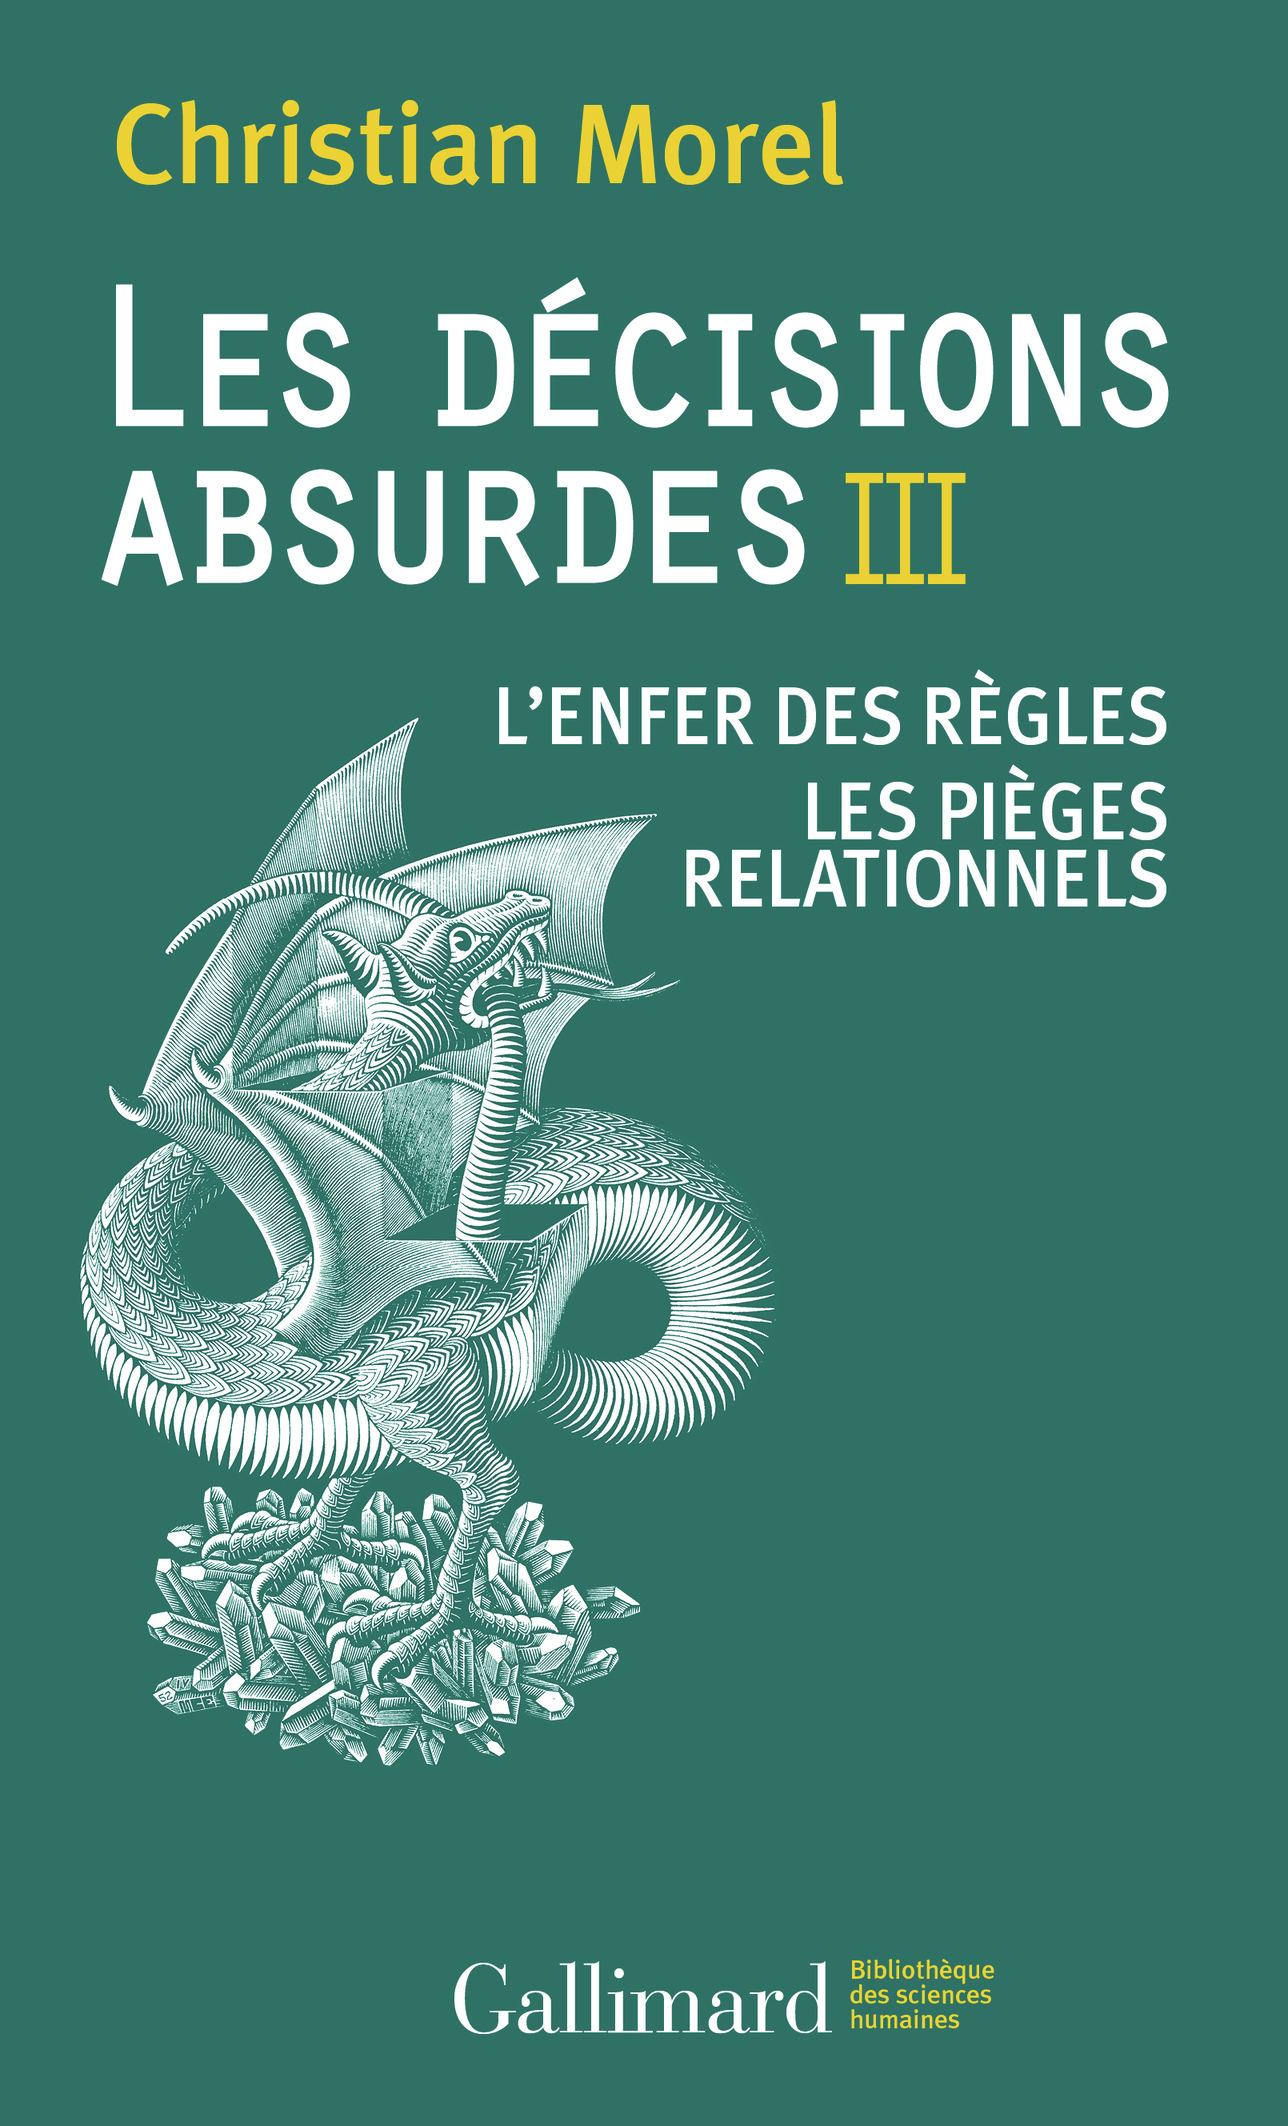 LES DECISIONS ABSURDES III